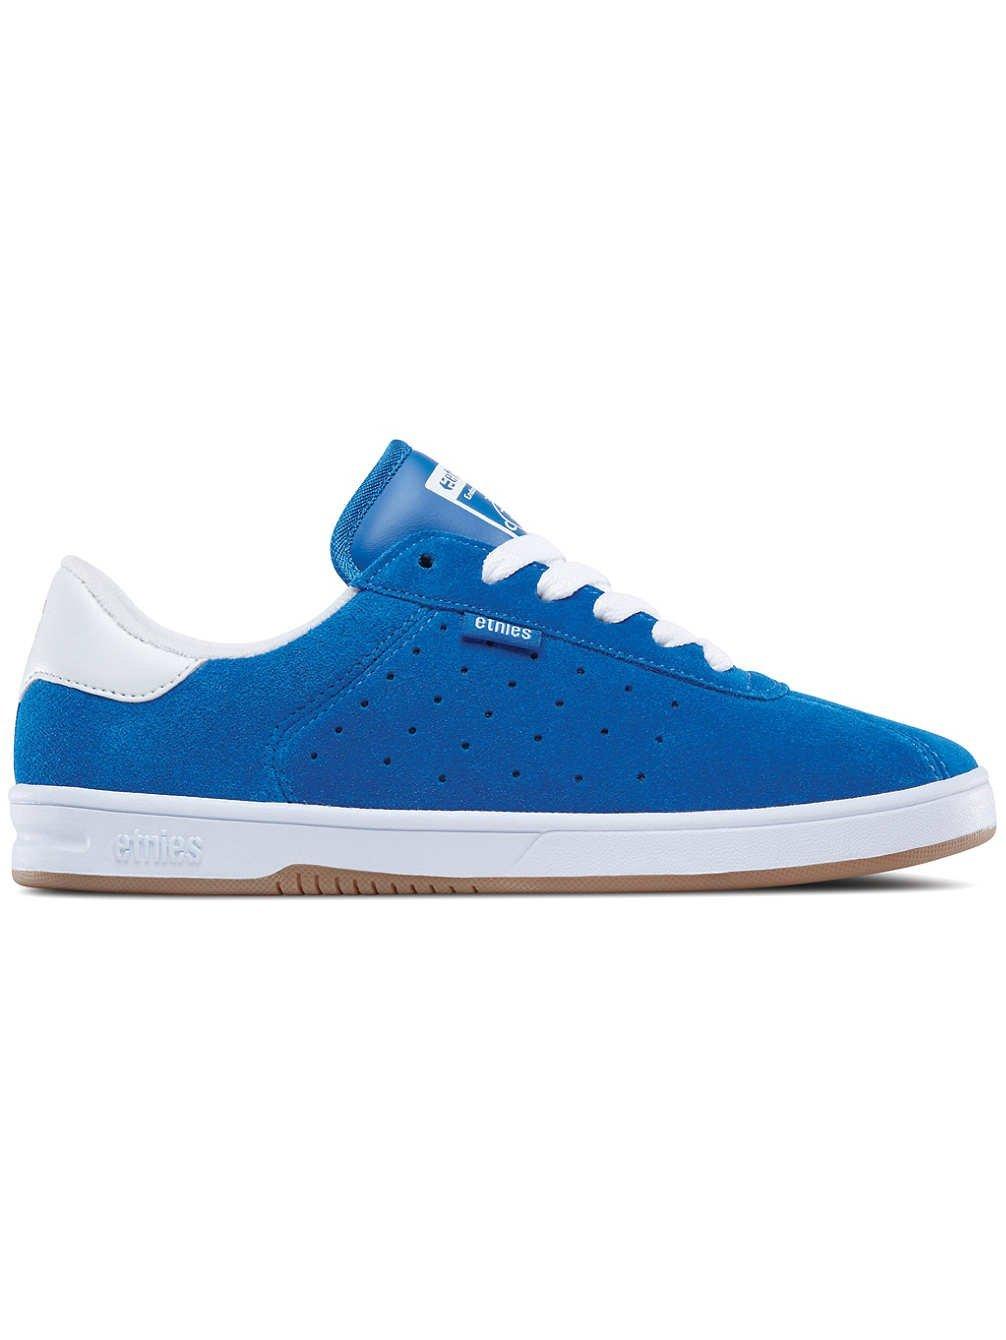 Etnies Women's The Scam W's Skate Shoe B01N3AMH1L 9.5 B(M) US|Blue/White